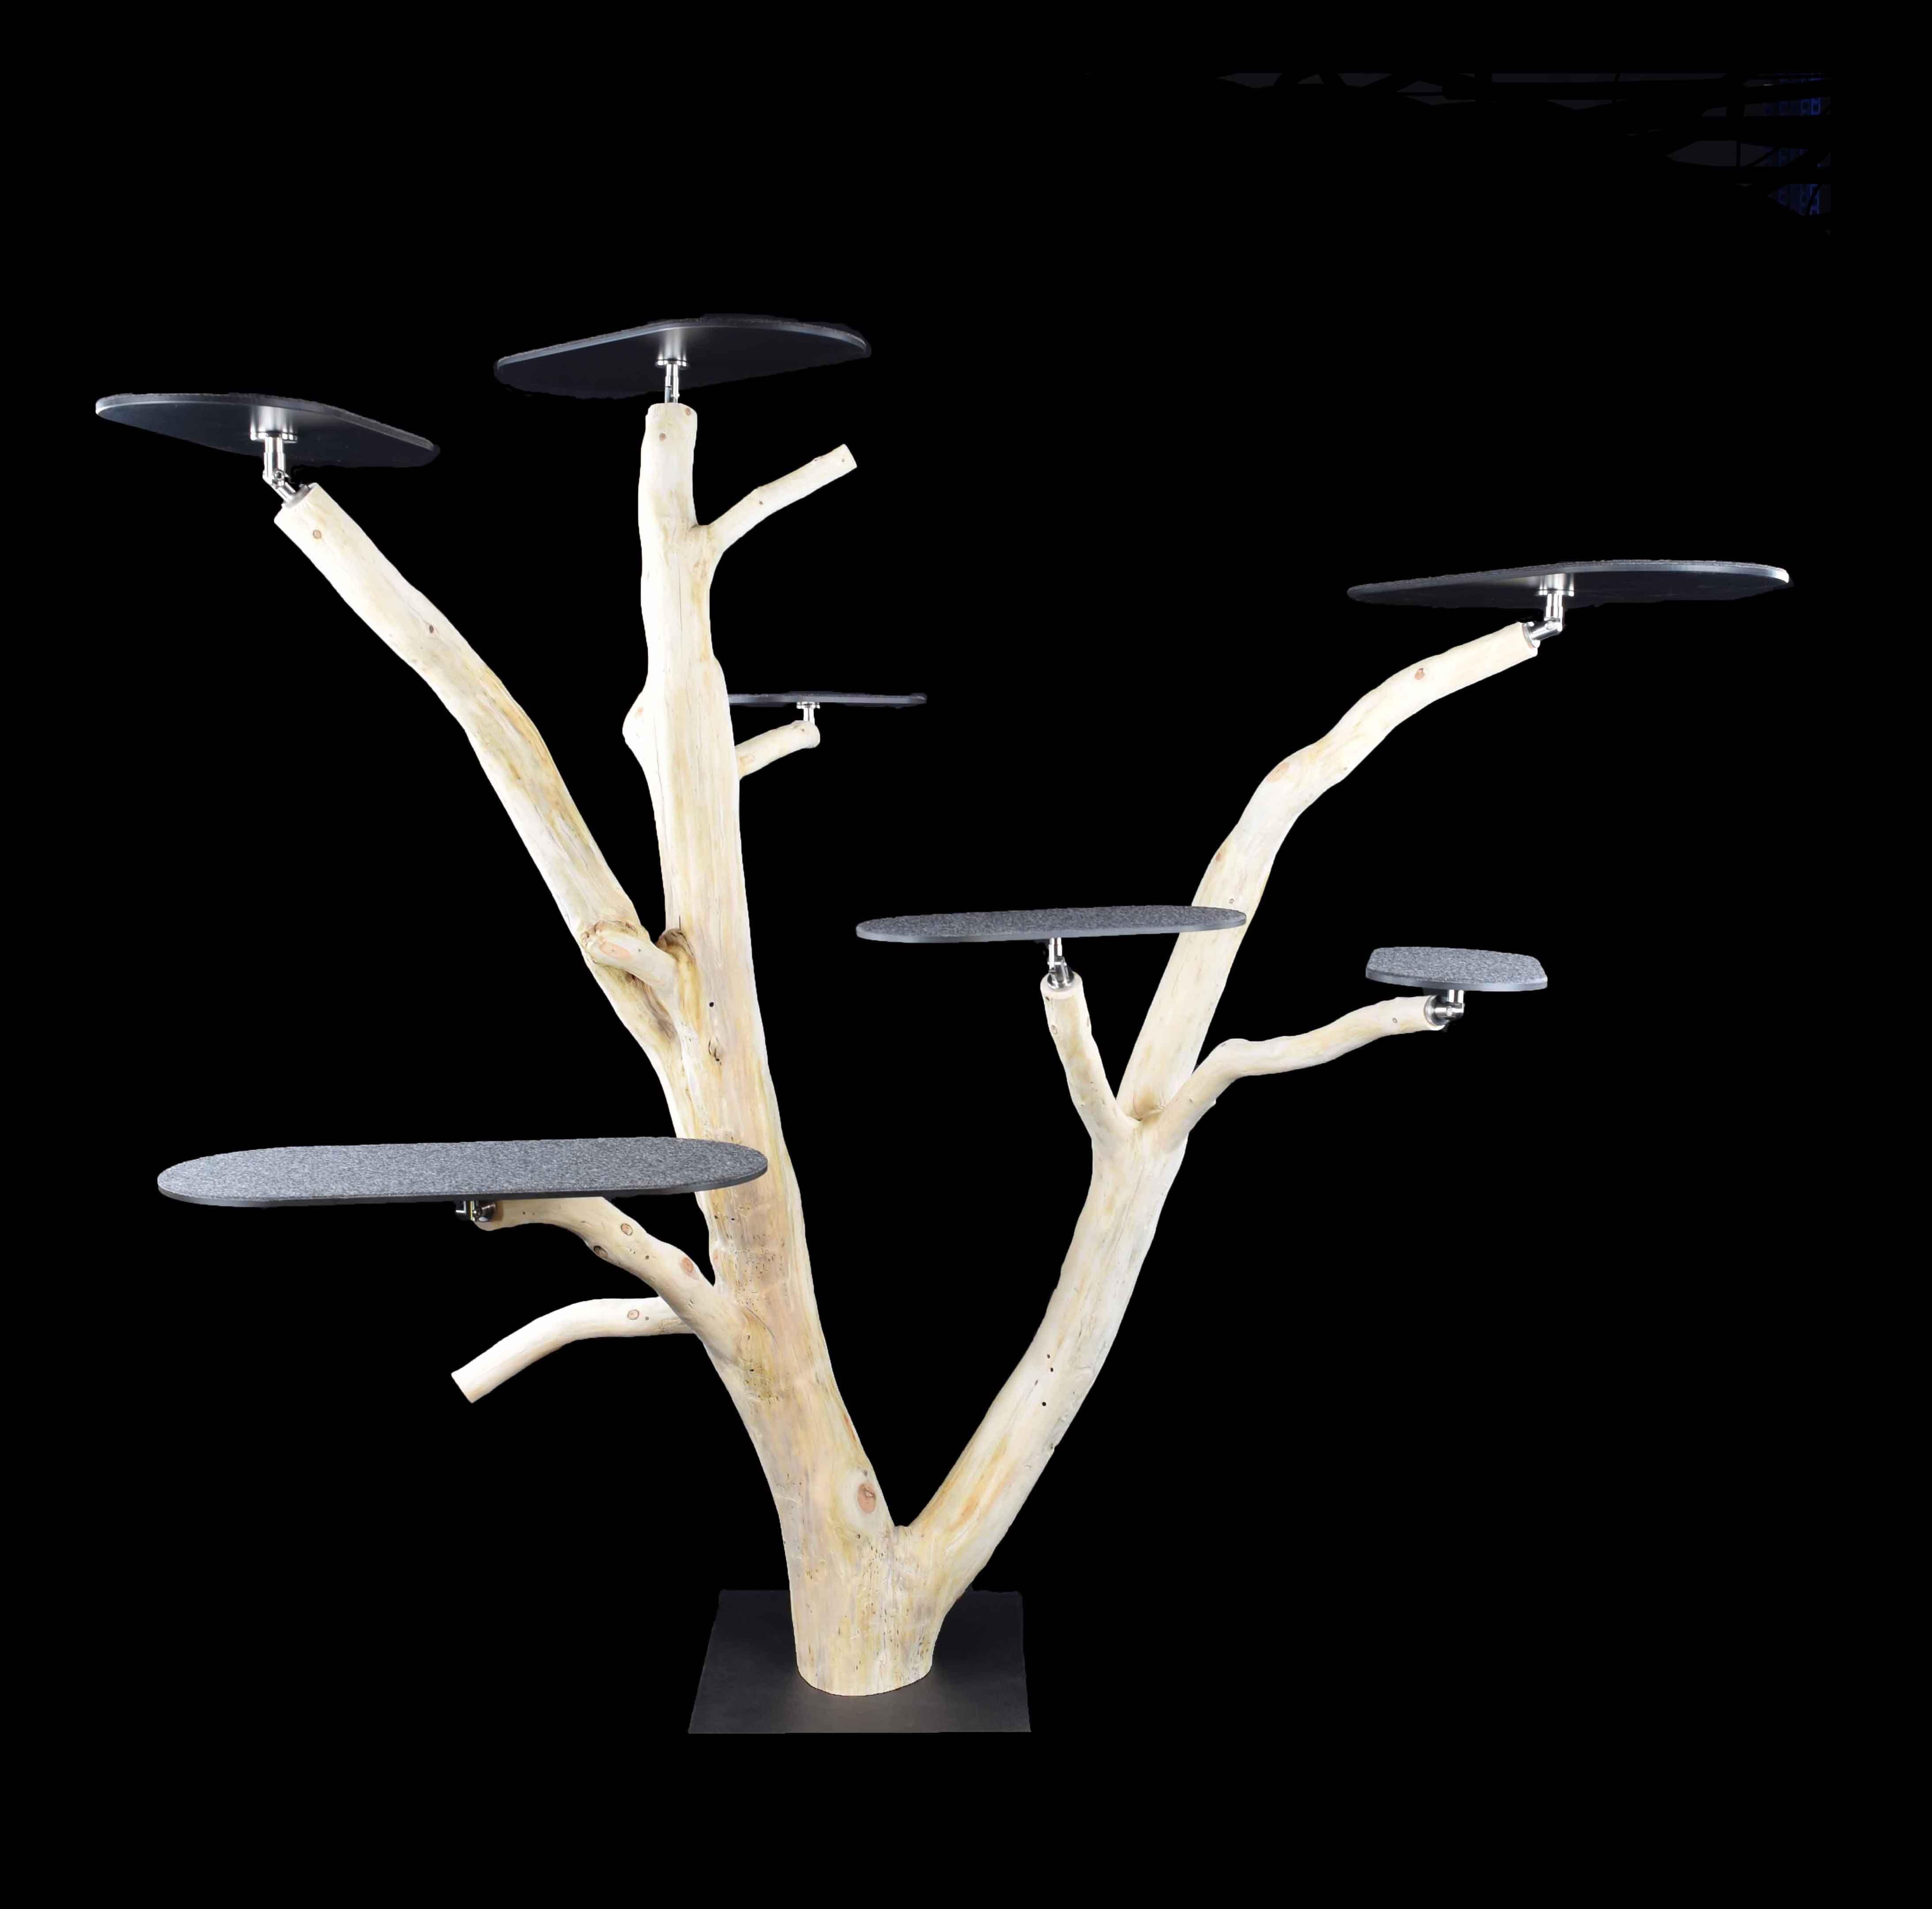 arbre chat naturel mobilier design furniture arbre support cat tree cats. Black Bedroom Furniture Sets. Home Design Ideas